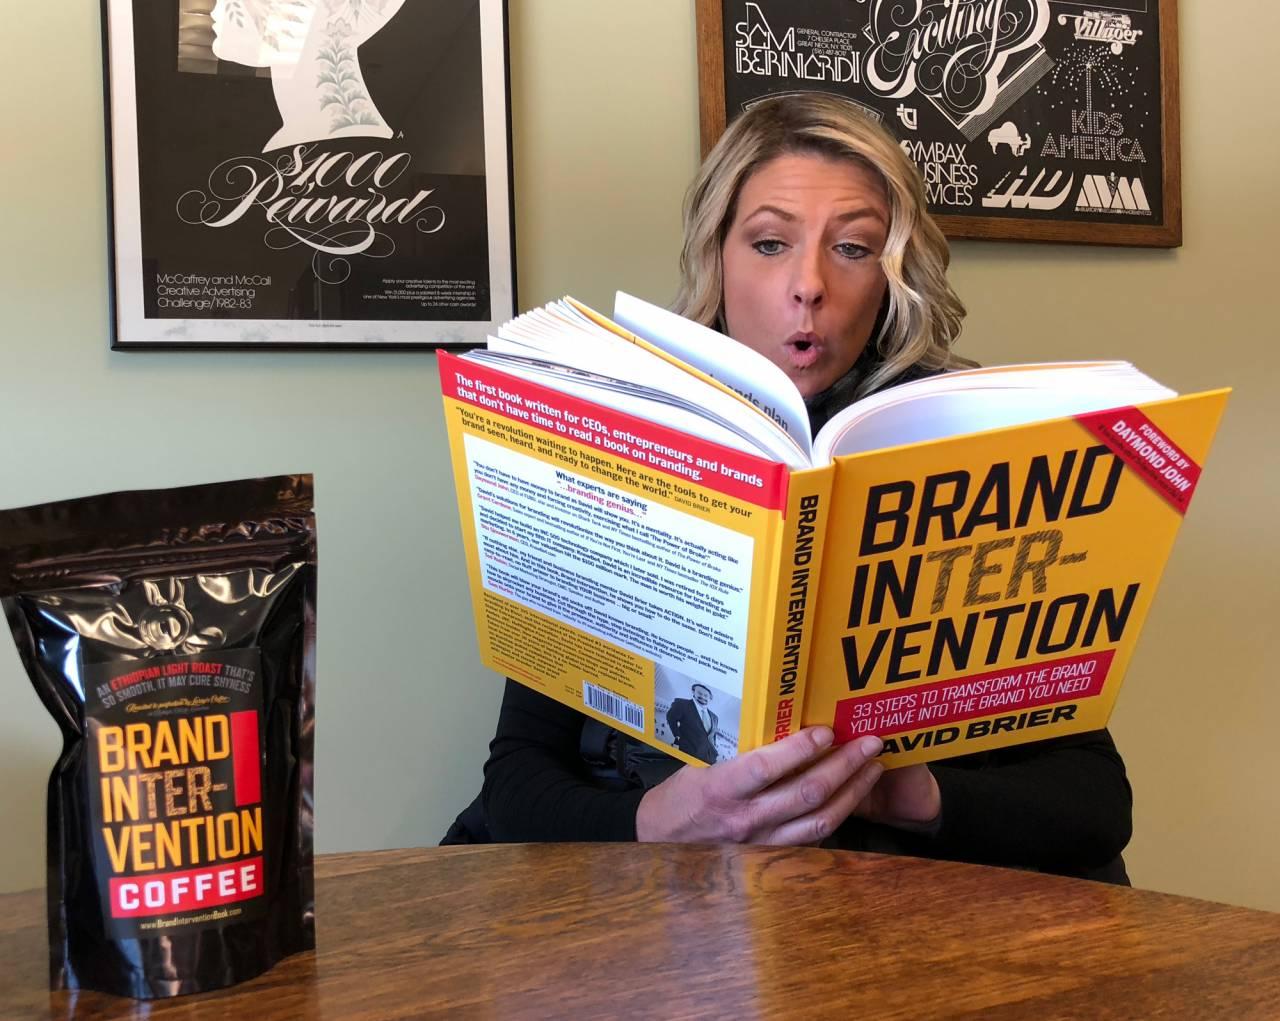 Brand Intervention movement